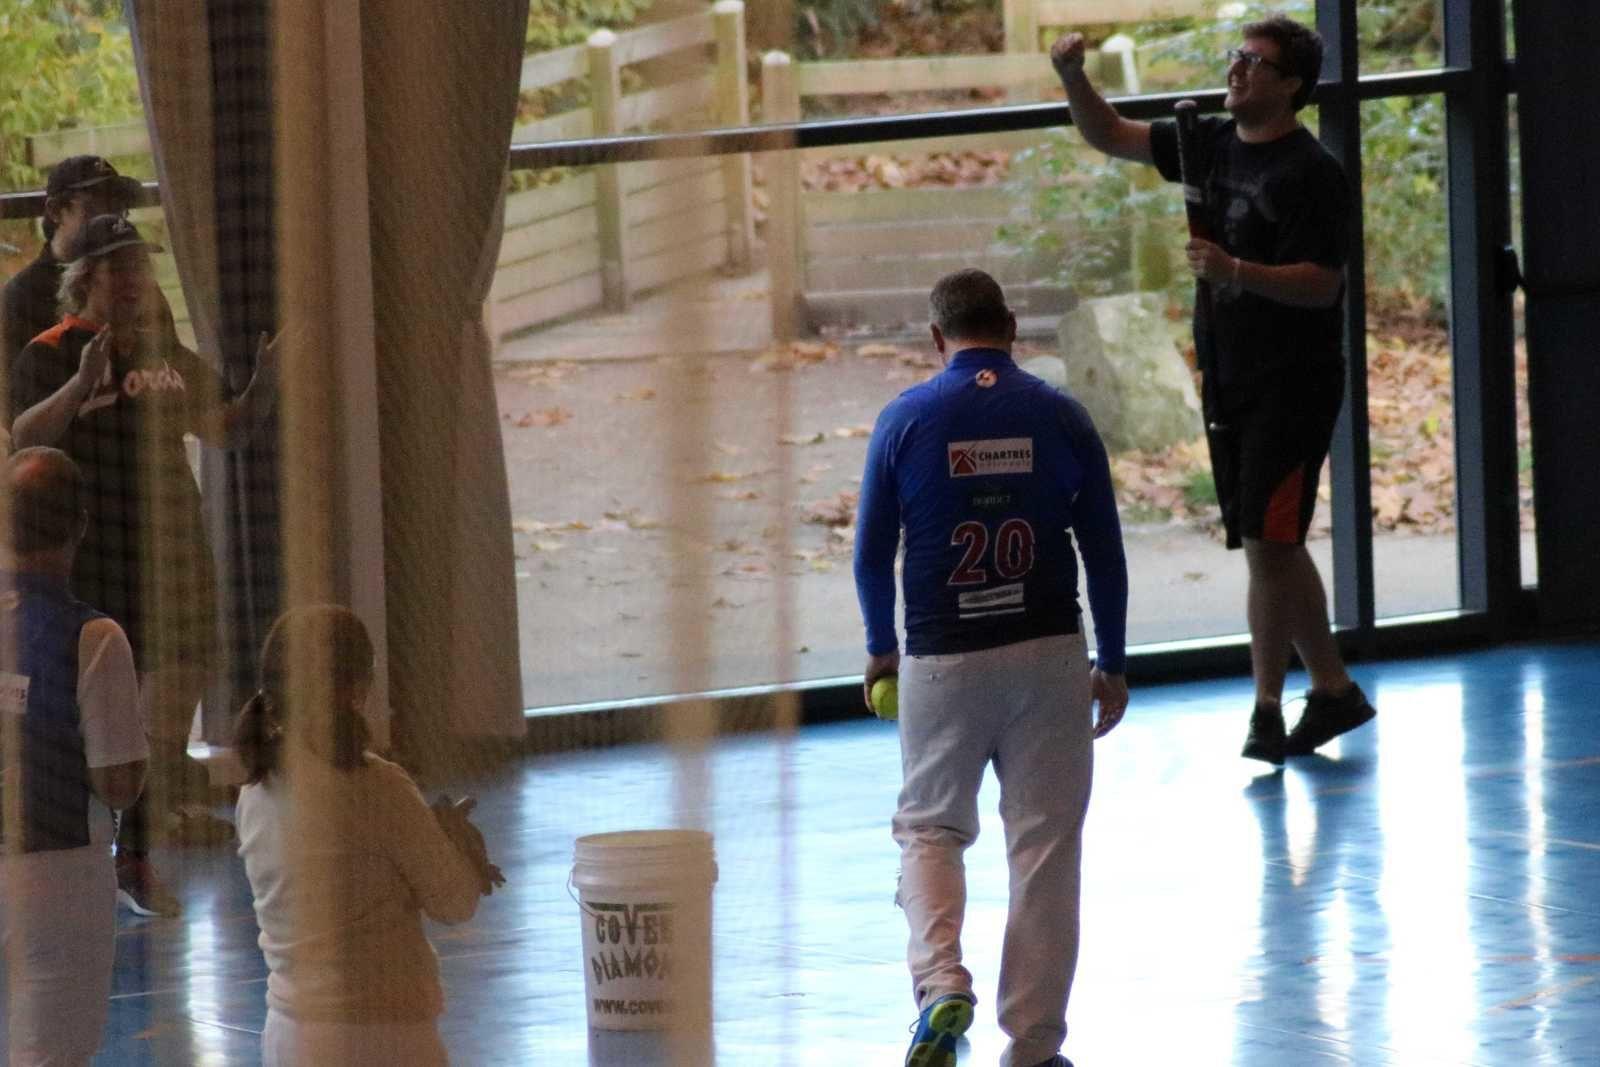 Softball Mixte - Tournoi de Rouen - 19 et 20 Novembre 2016